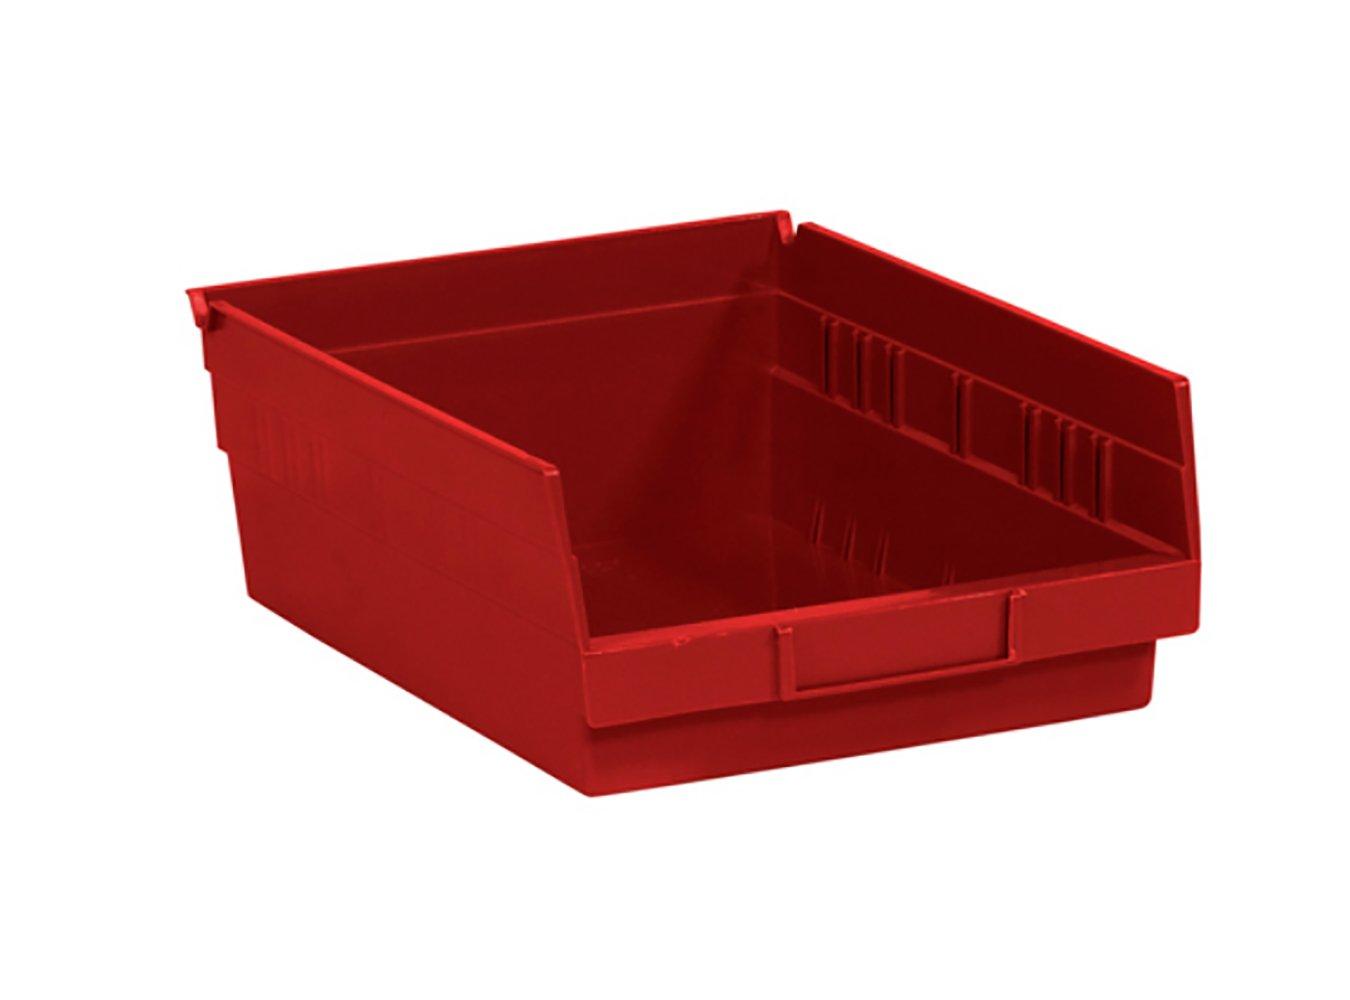 RetailSource Ltd BINPS104R RetailSource 11 5//8 x 8 3//8 x 4 Red Plastic Shelf Bin Boxes Pack of 20